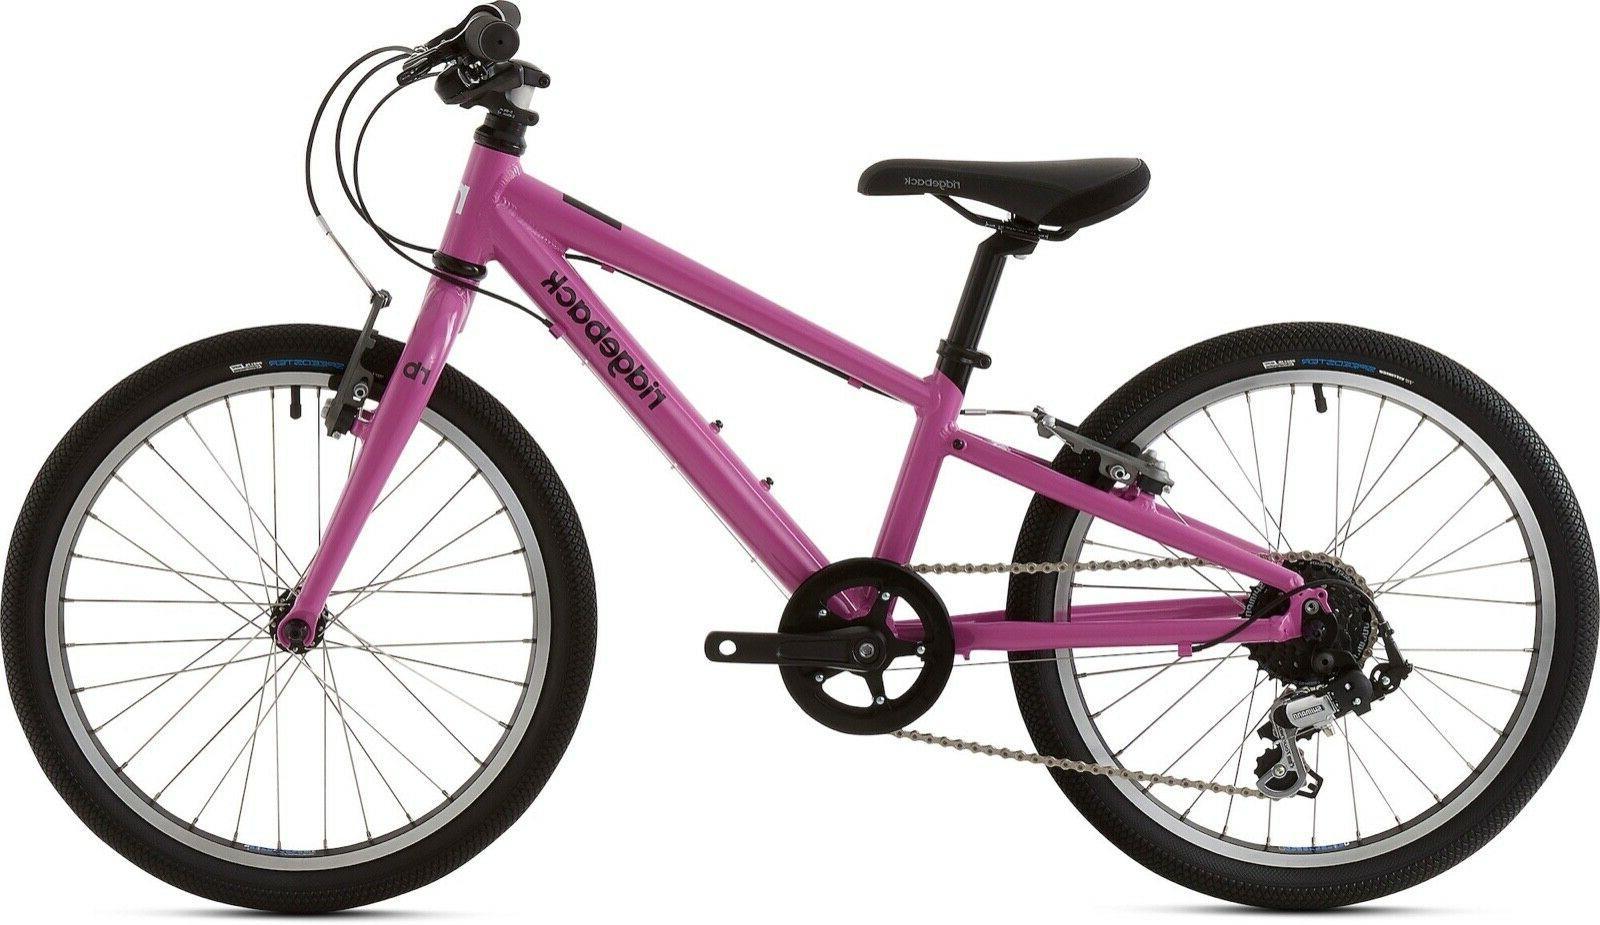 dimension 20 kids bike by weebikeshop